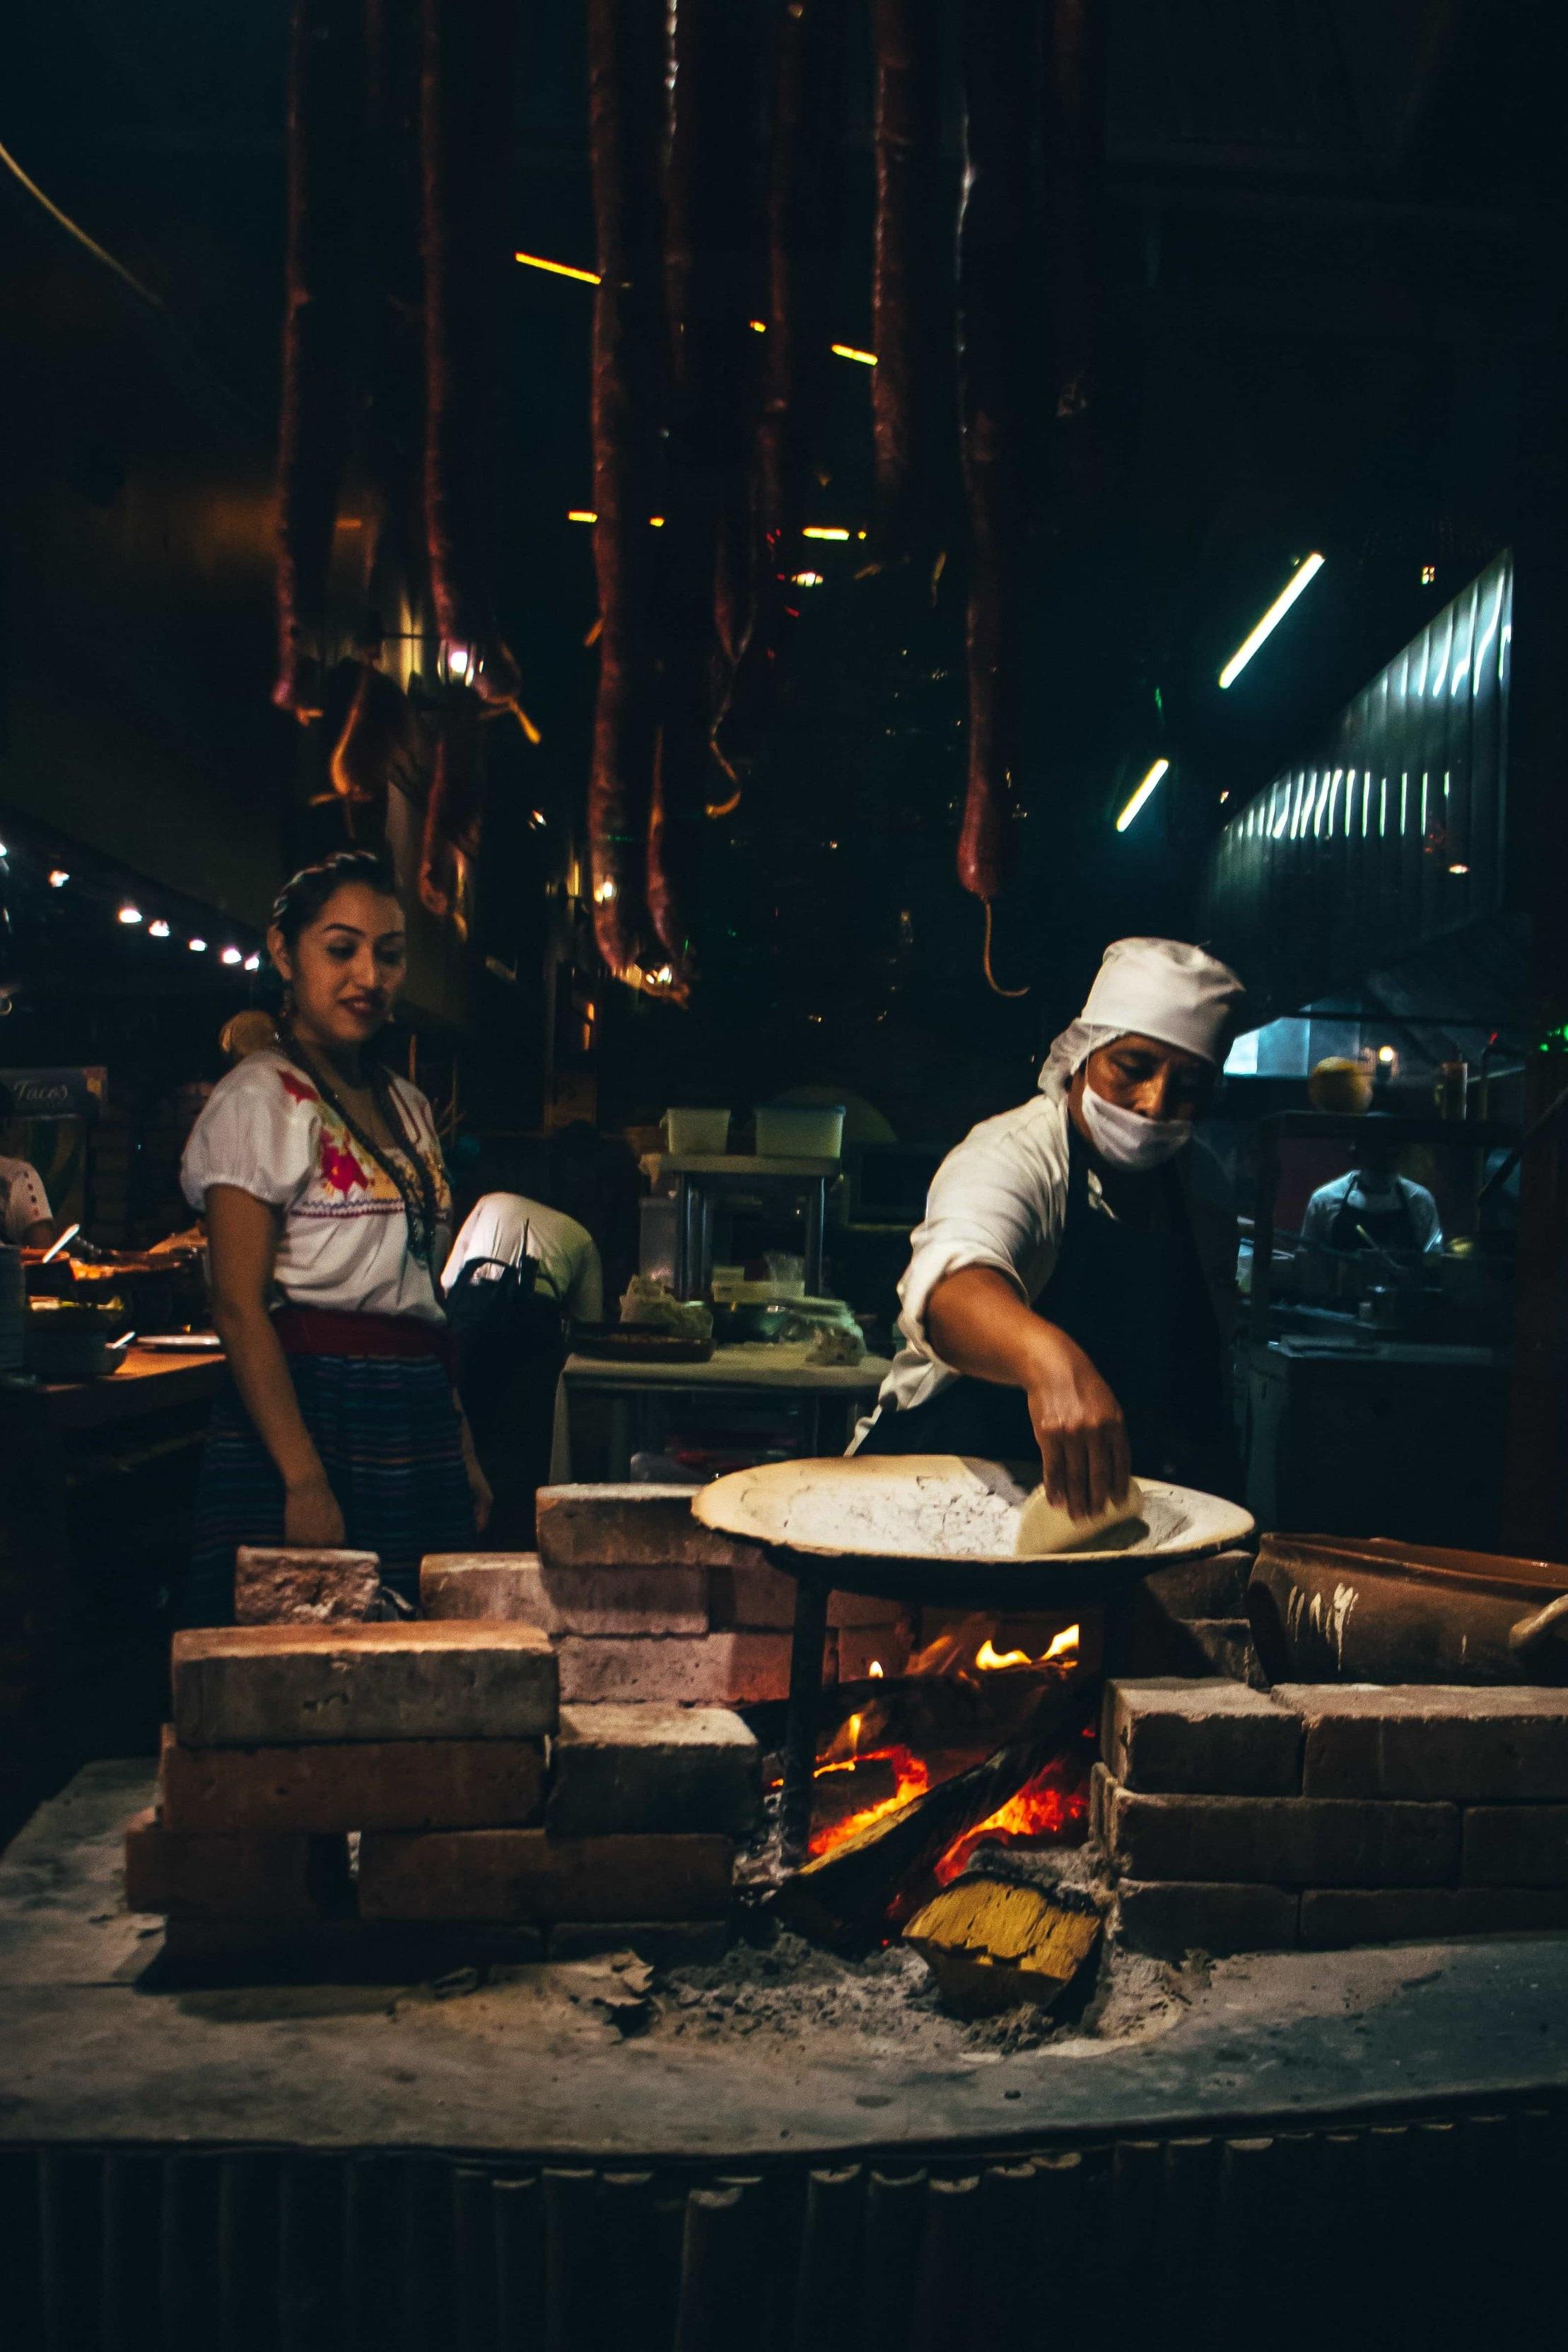 """The kitchen is alive"", Villahermosa, <Travelhund>"